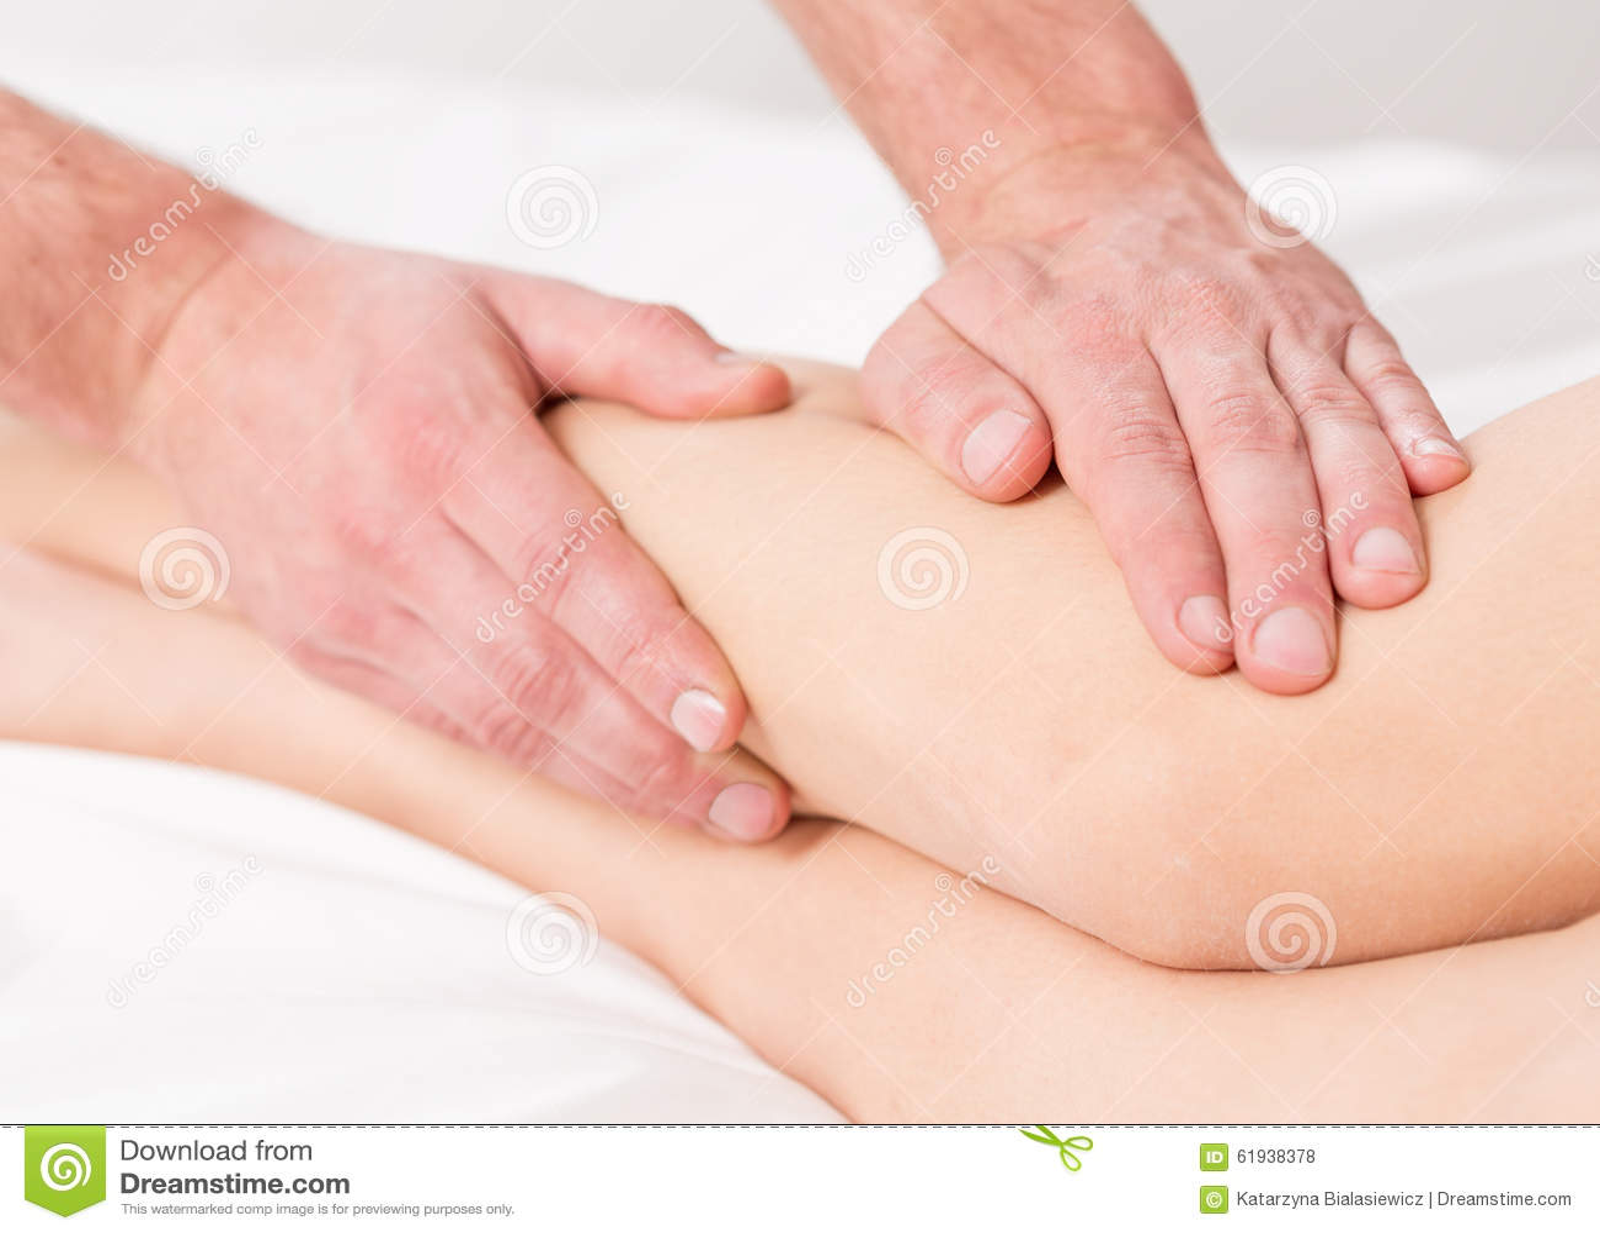 Manual Medical Massage Technique Stock Photo